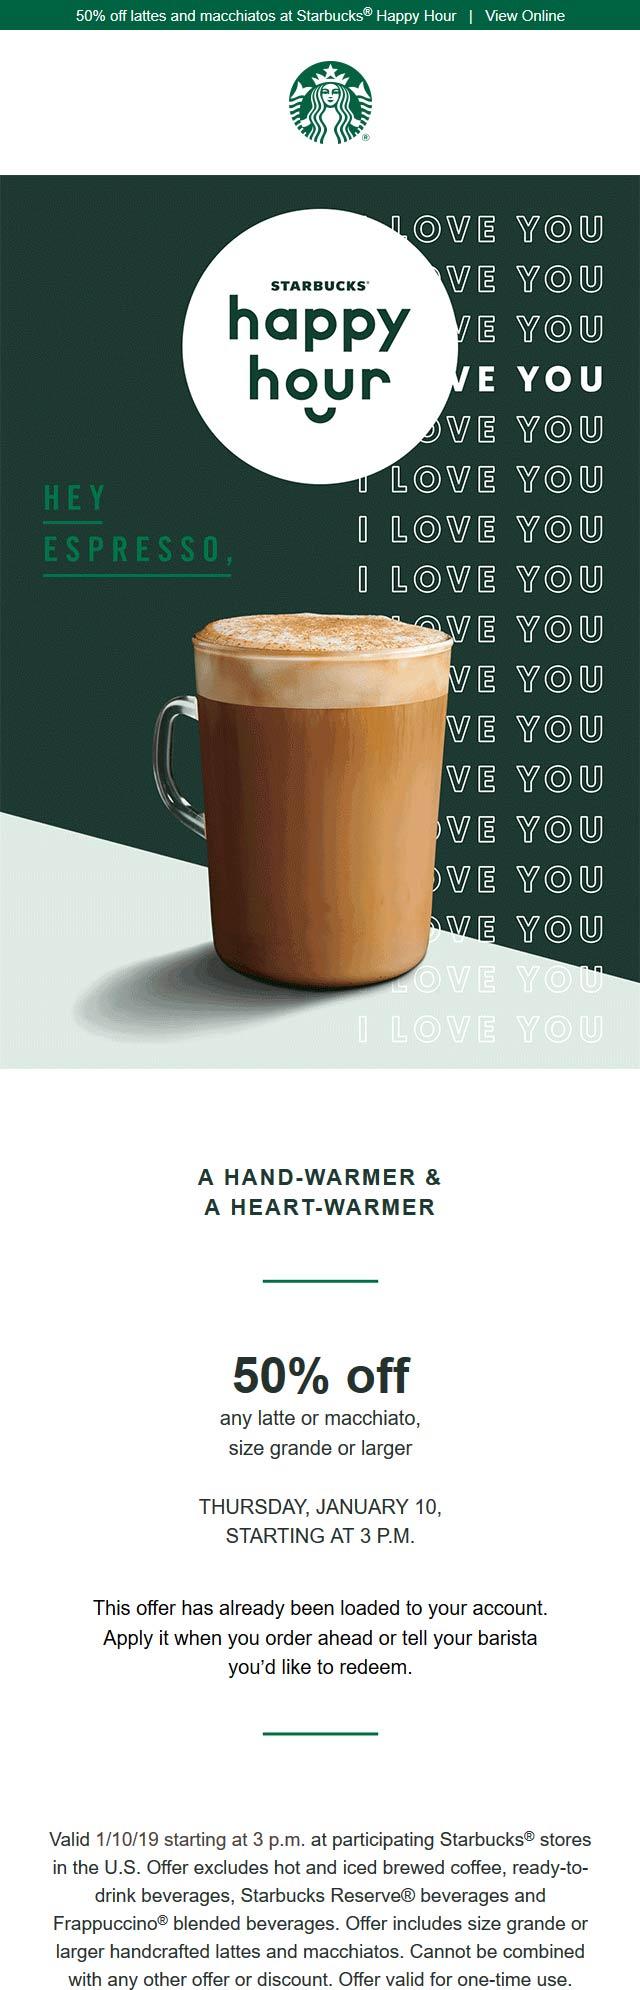 Starbucks Coupon July 2020 Reward members enjoy 50% off a latte or macchiato today at Starbucks